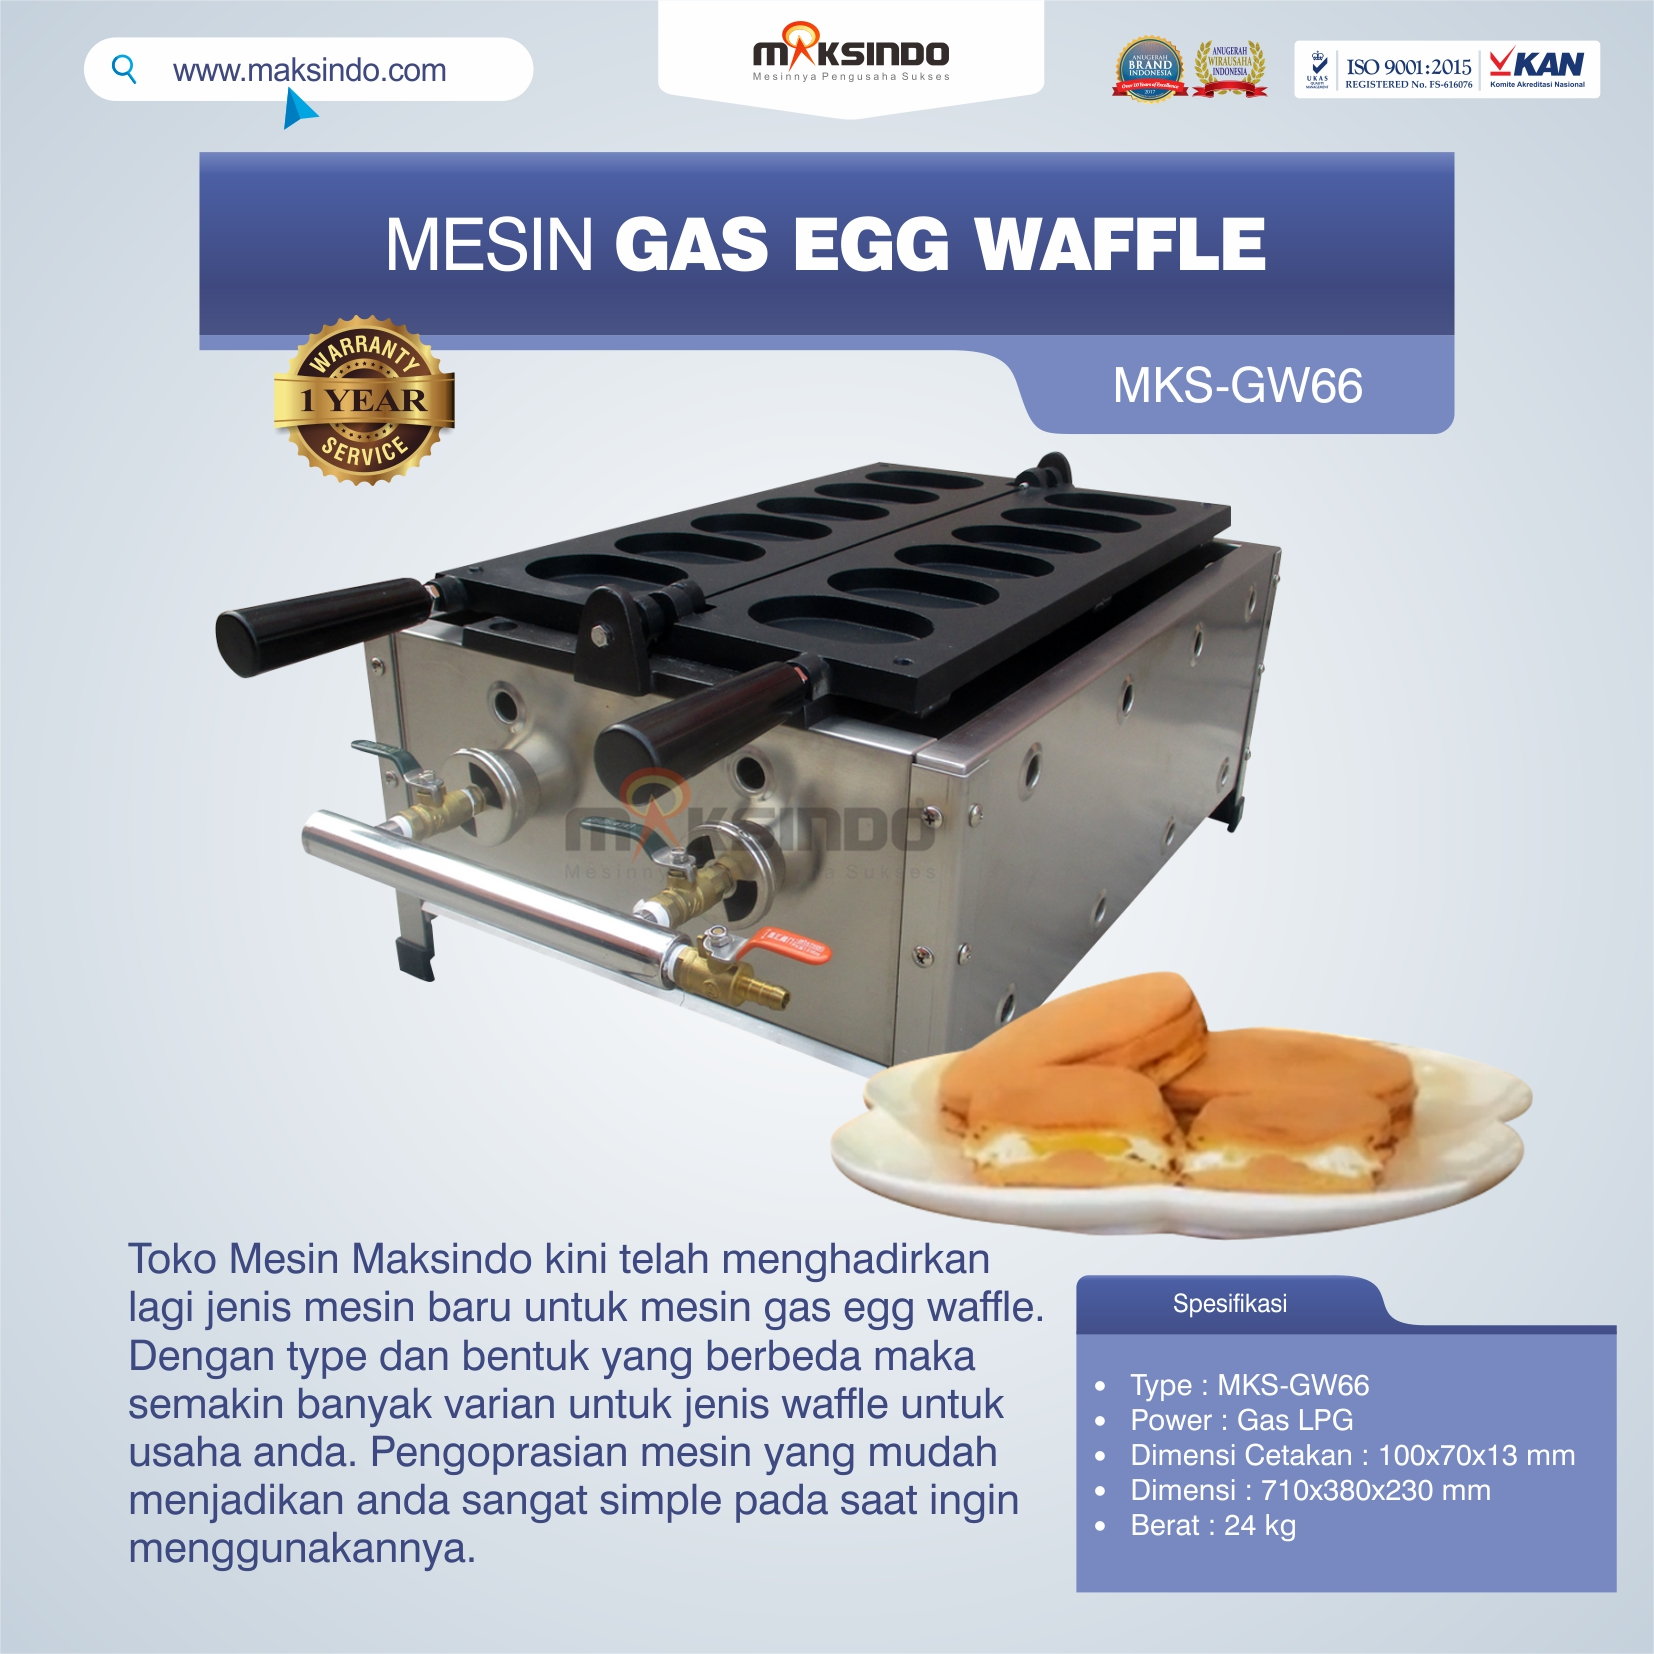 Jual Mesin Gas Egg Waffle GW66 di Bekasi